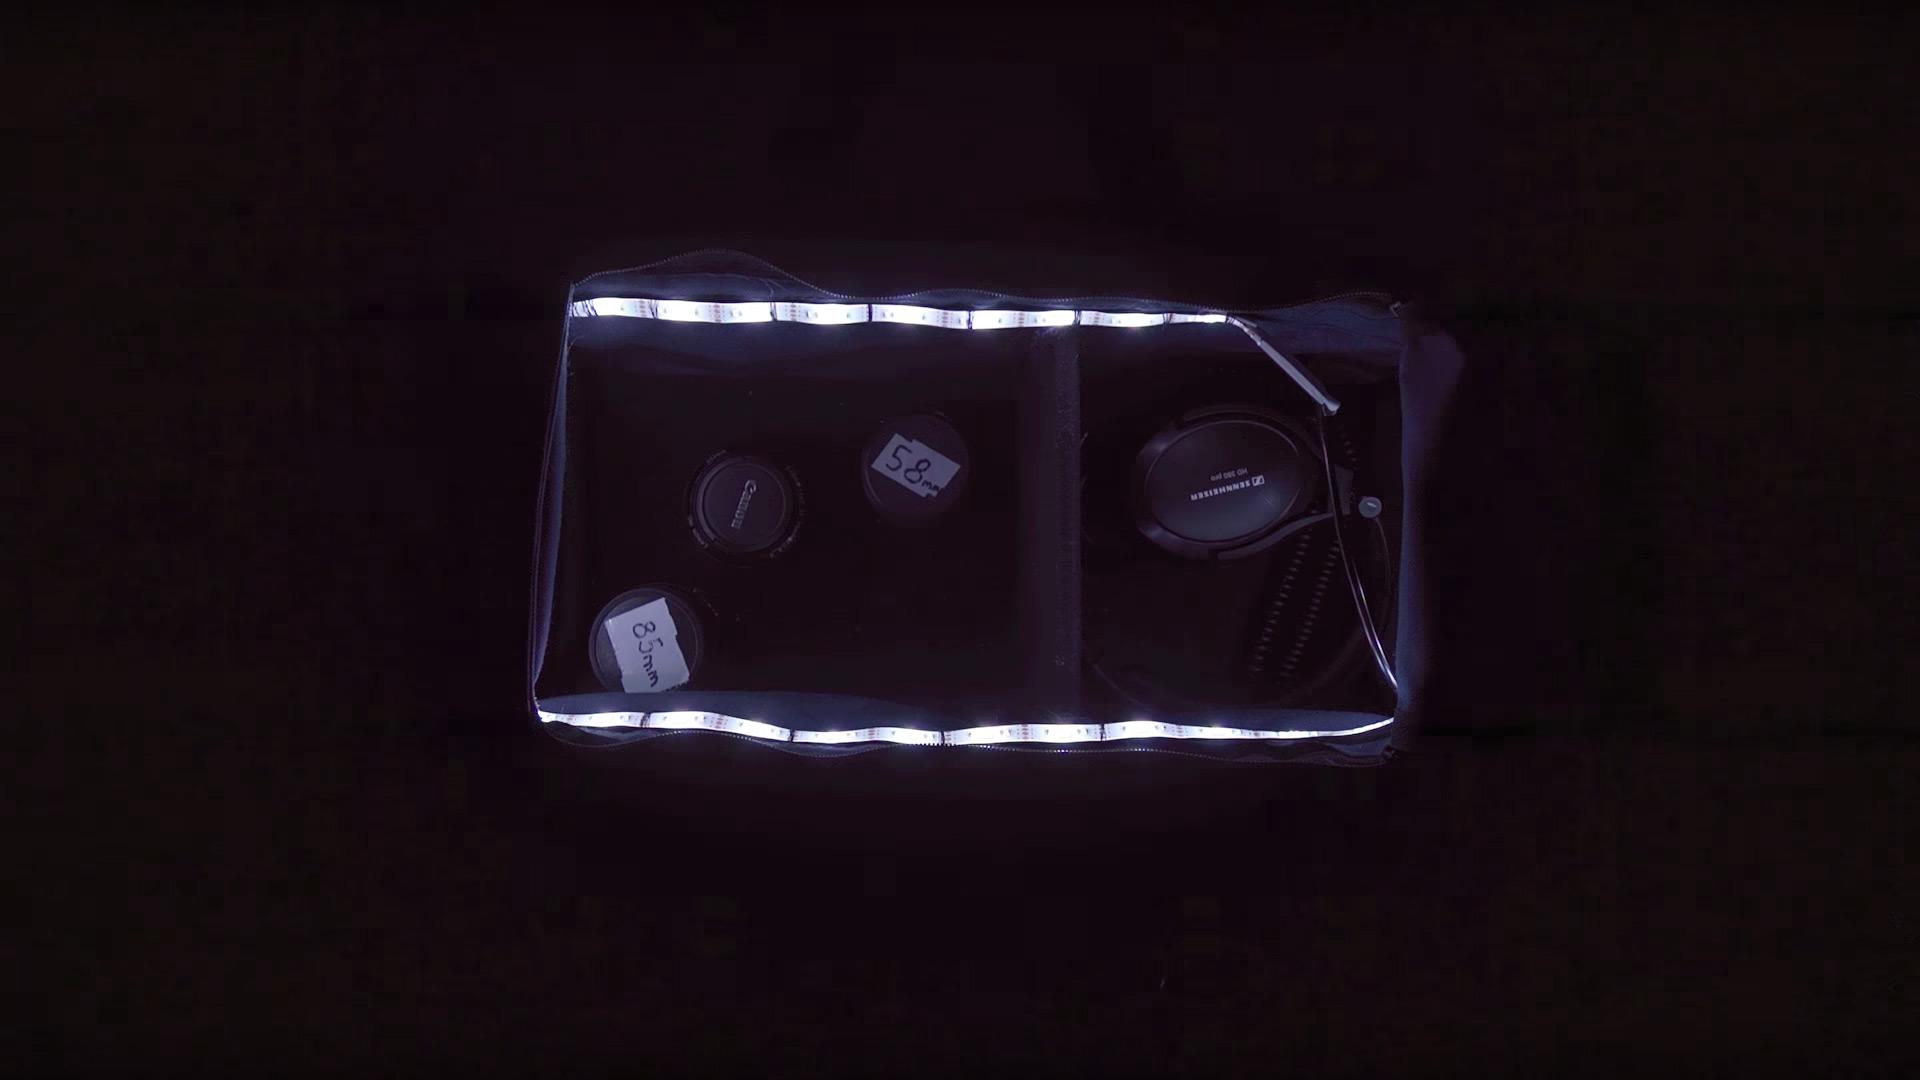 Lights-for-your-camera-bag-With-LED-lights1.jpg